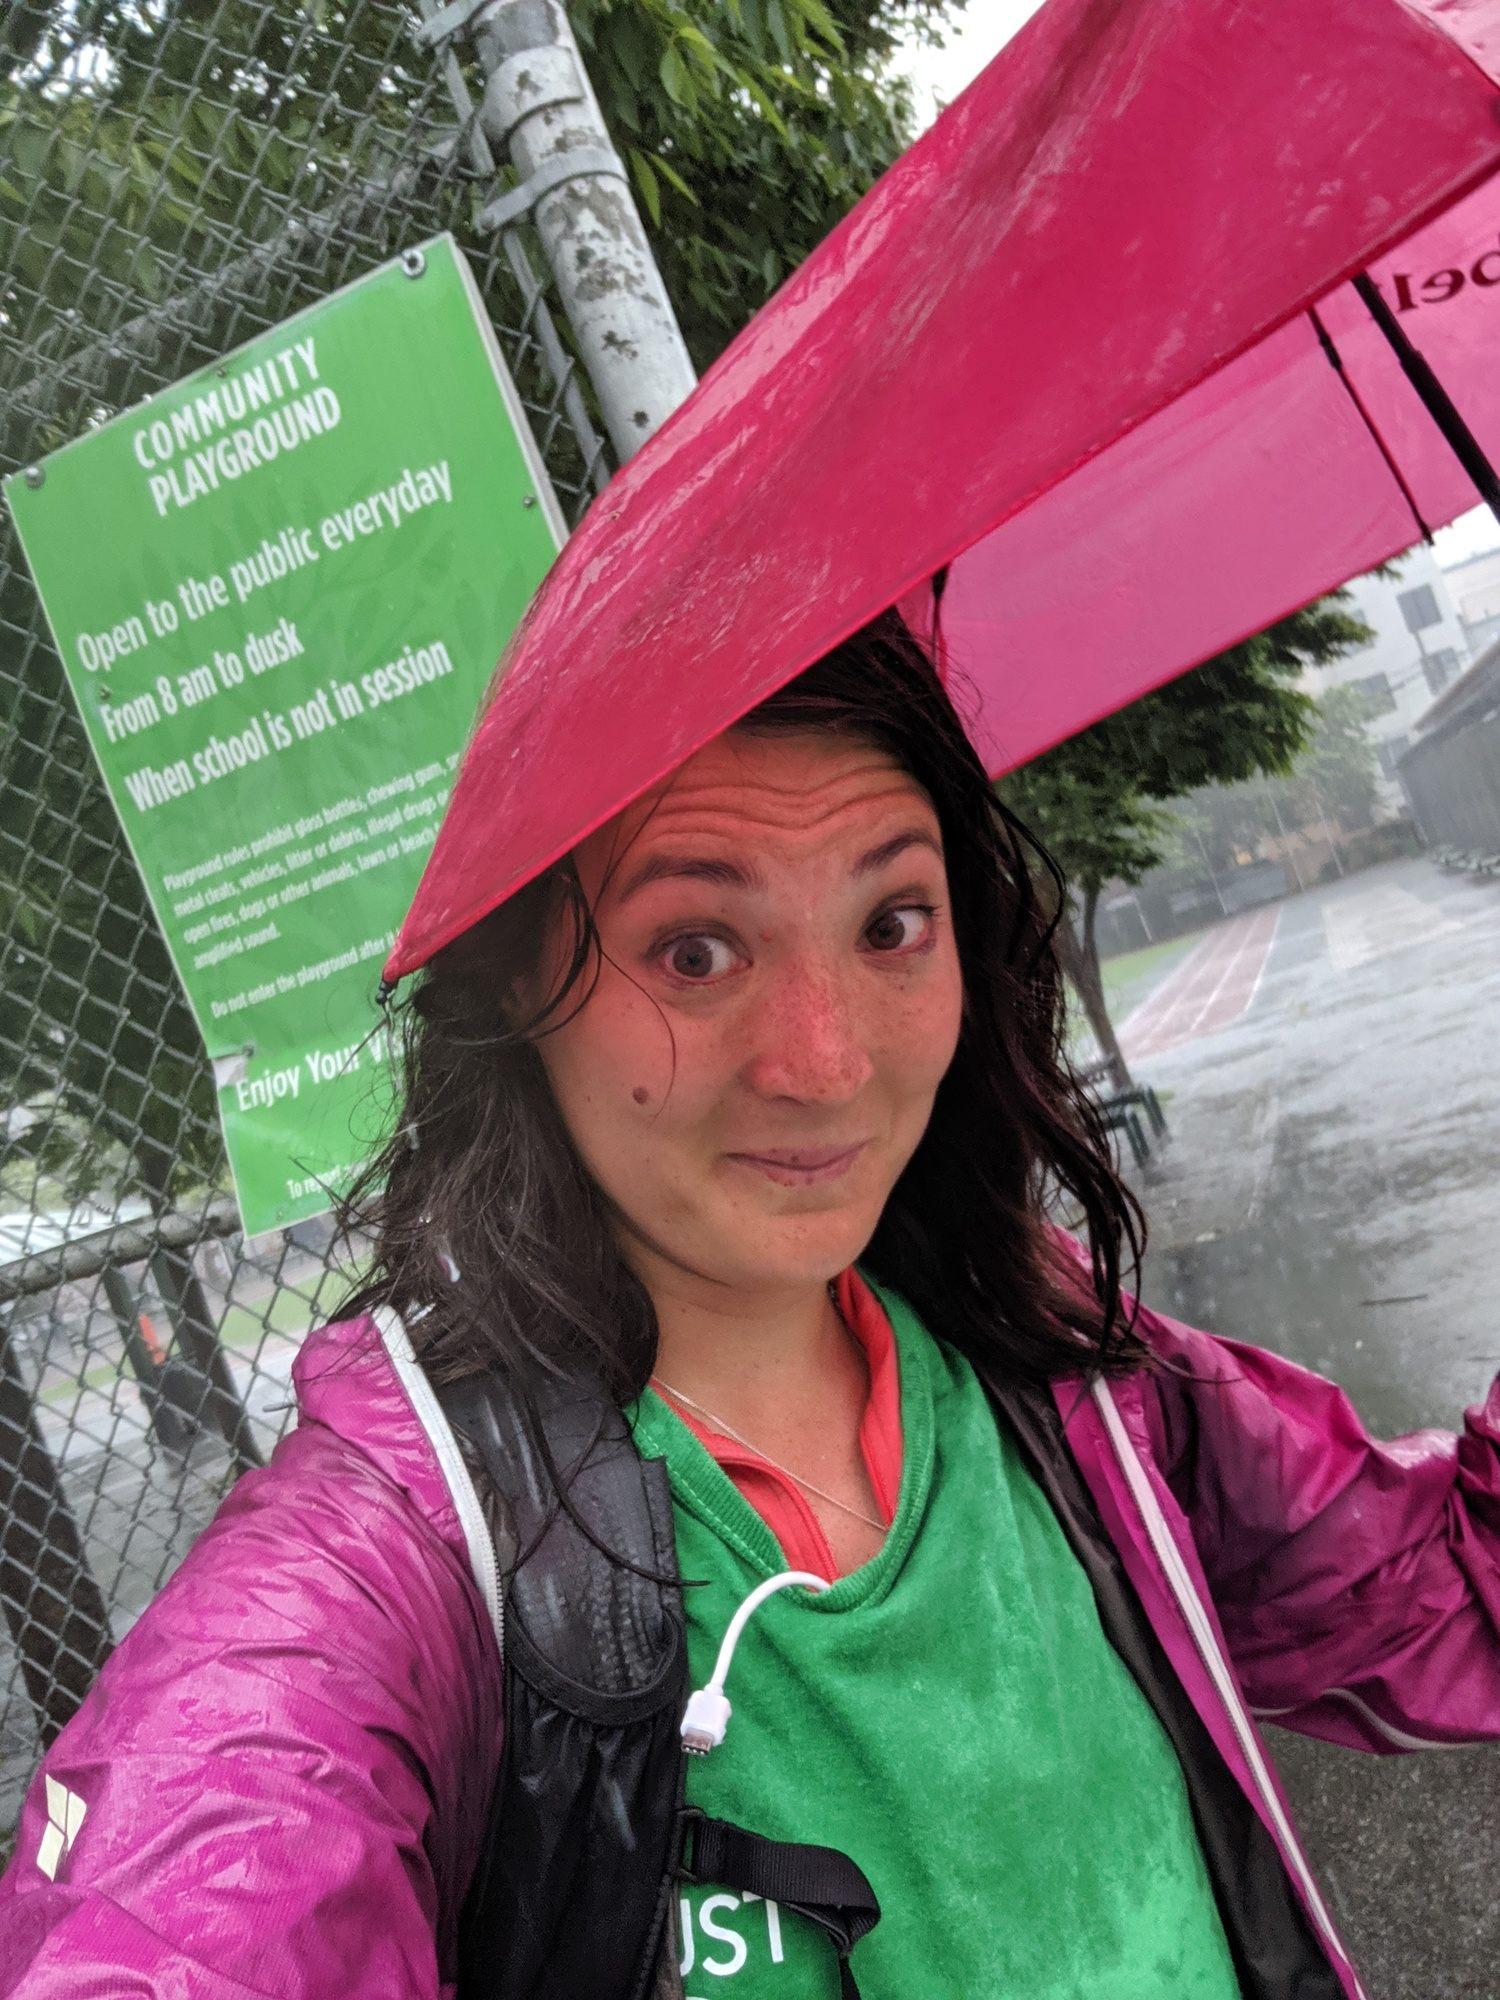 Liz Thomas using the Montbell UL Trekking umbrella during a rainstorm in New York City.